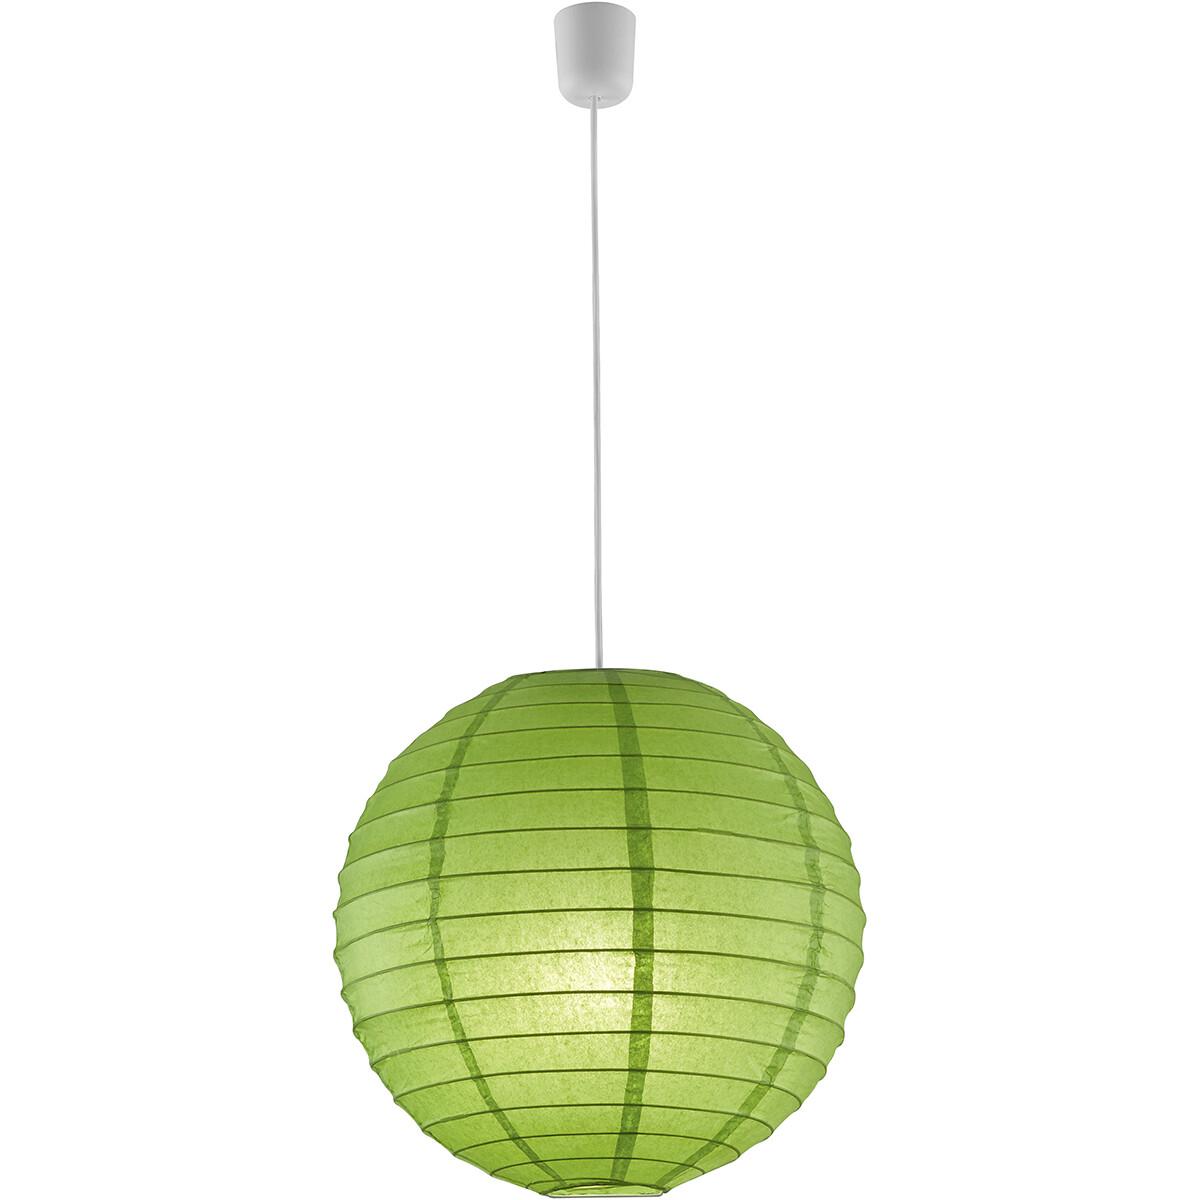 LED Hanglamp - Hangverlichting - Trion Ponton - Rond - Mat Groen - Papier